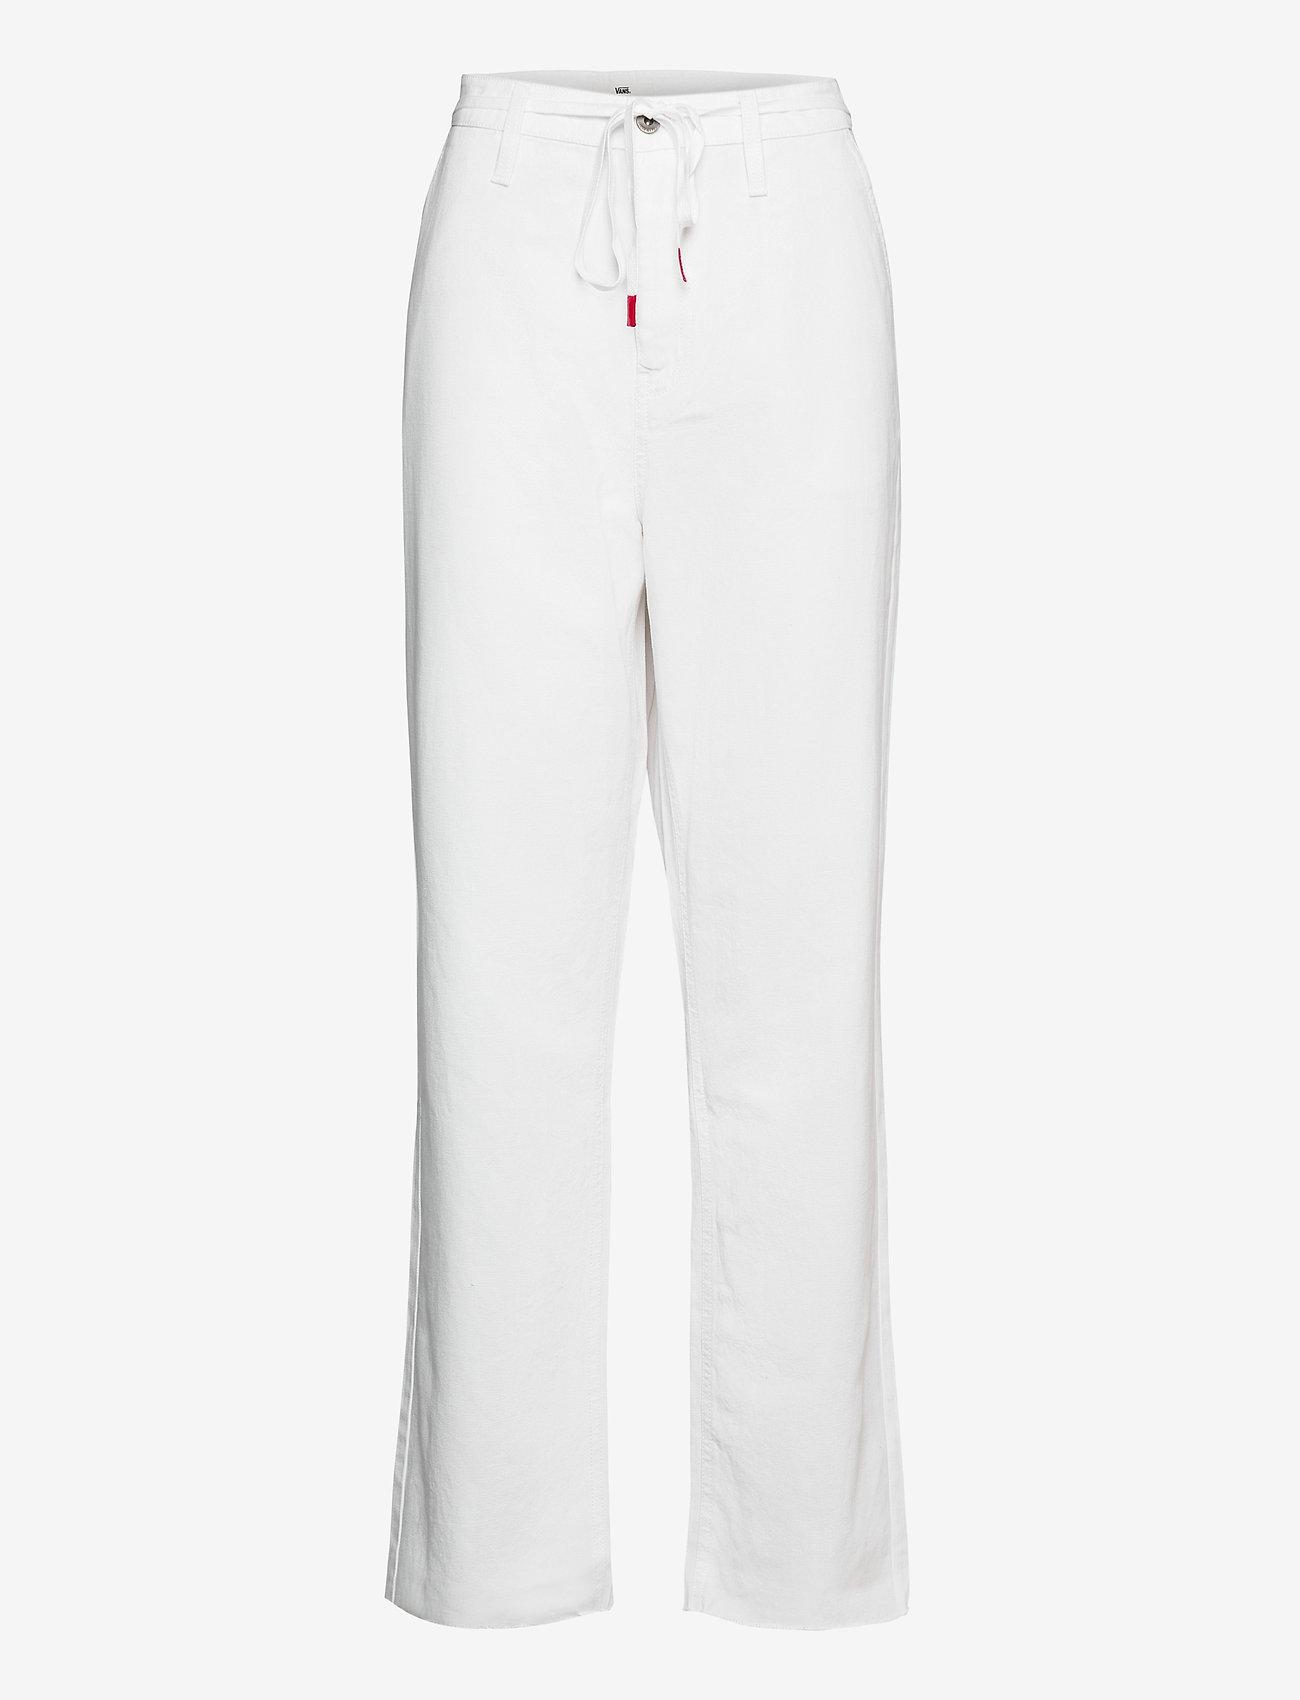 VANS - MAKE ME YOUR OWN PANT - sportbroeken - white - 0